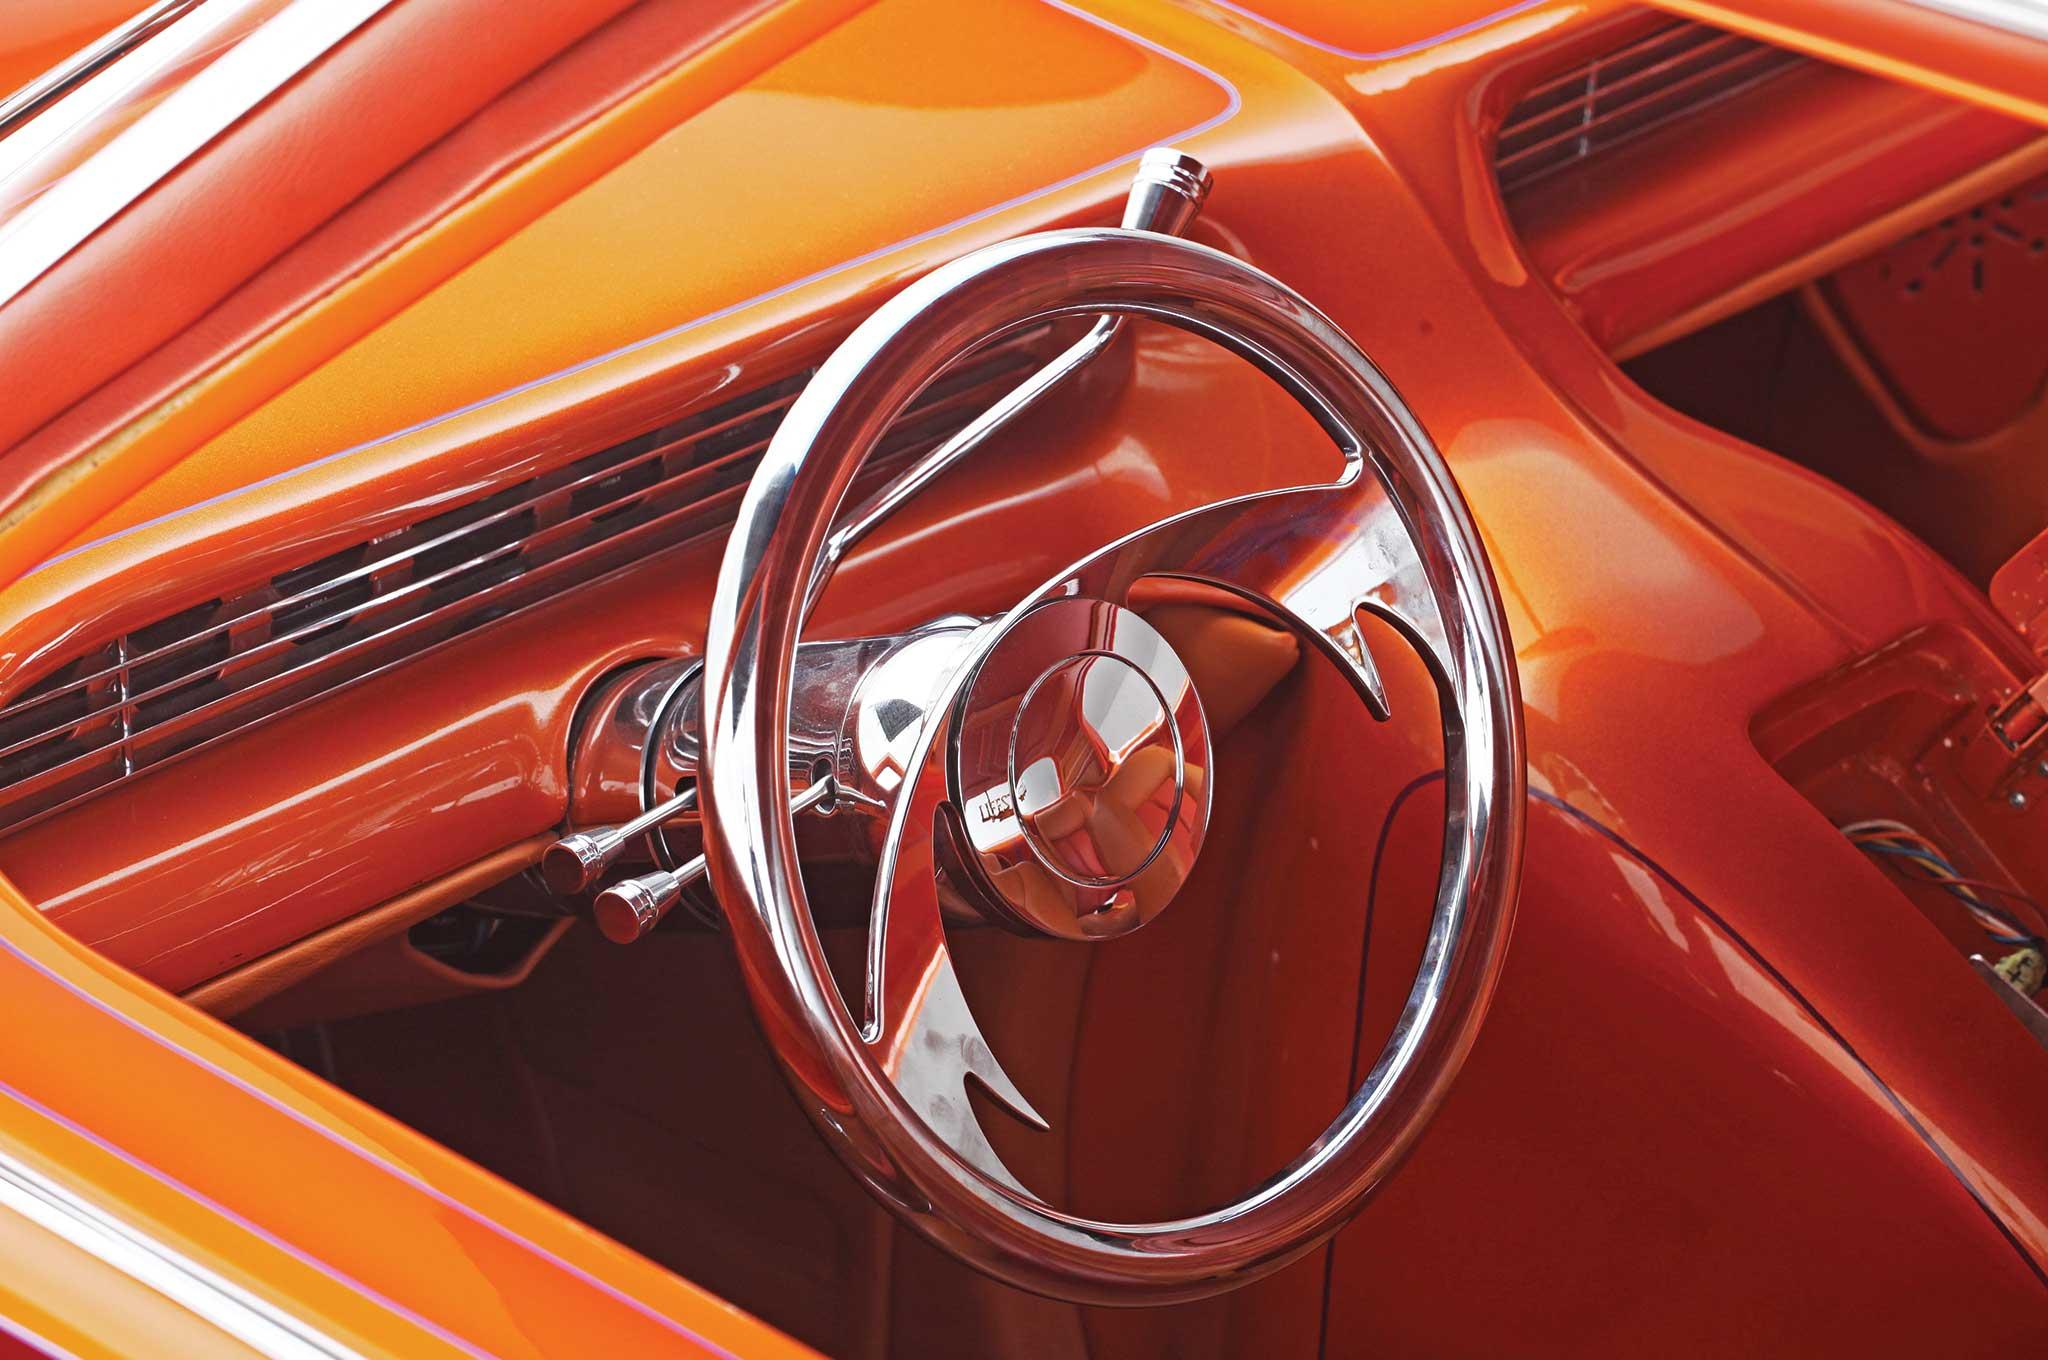 1972 Chevrolet Caprice - Serial Thriller - Lowrider